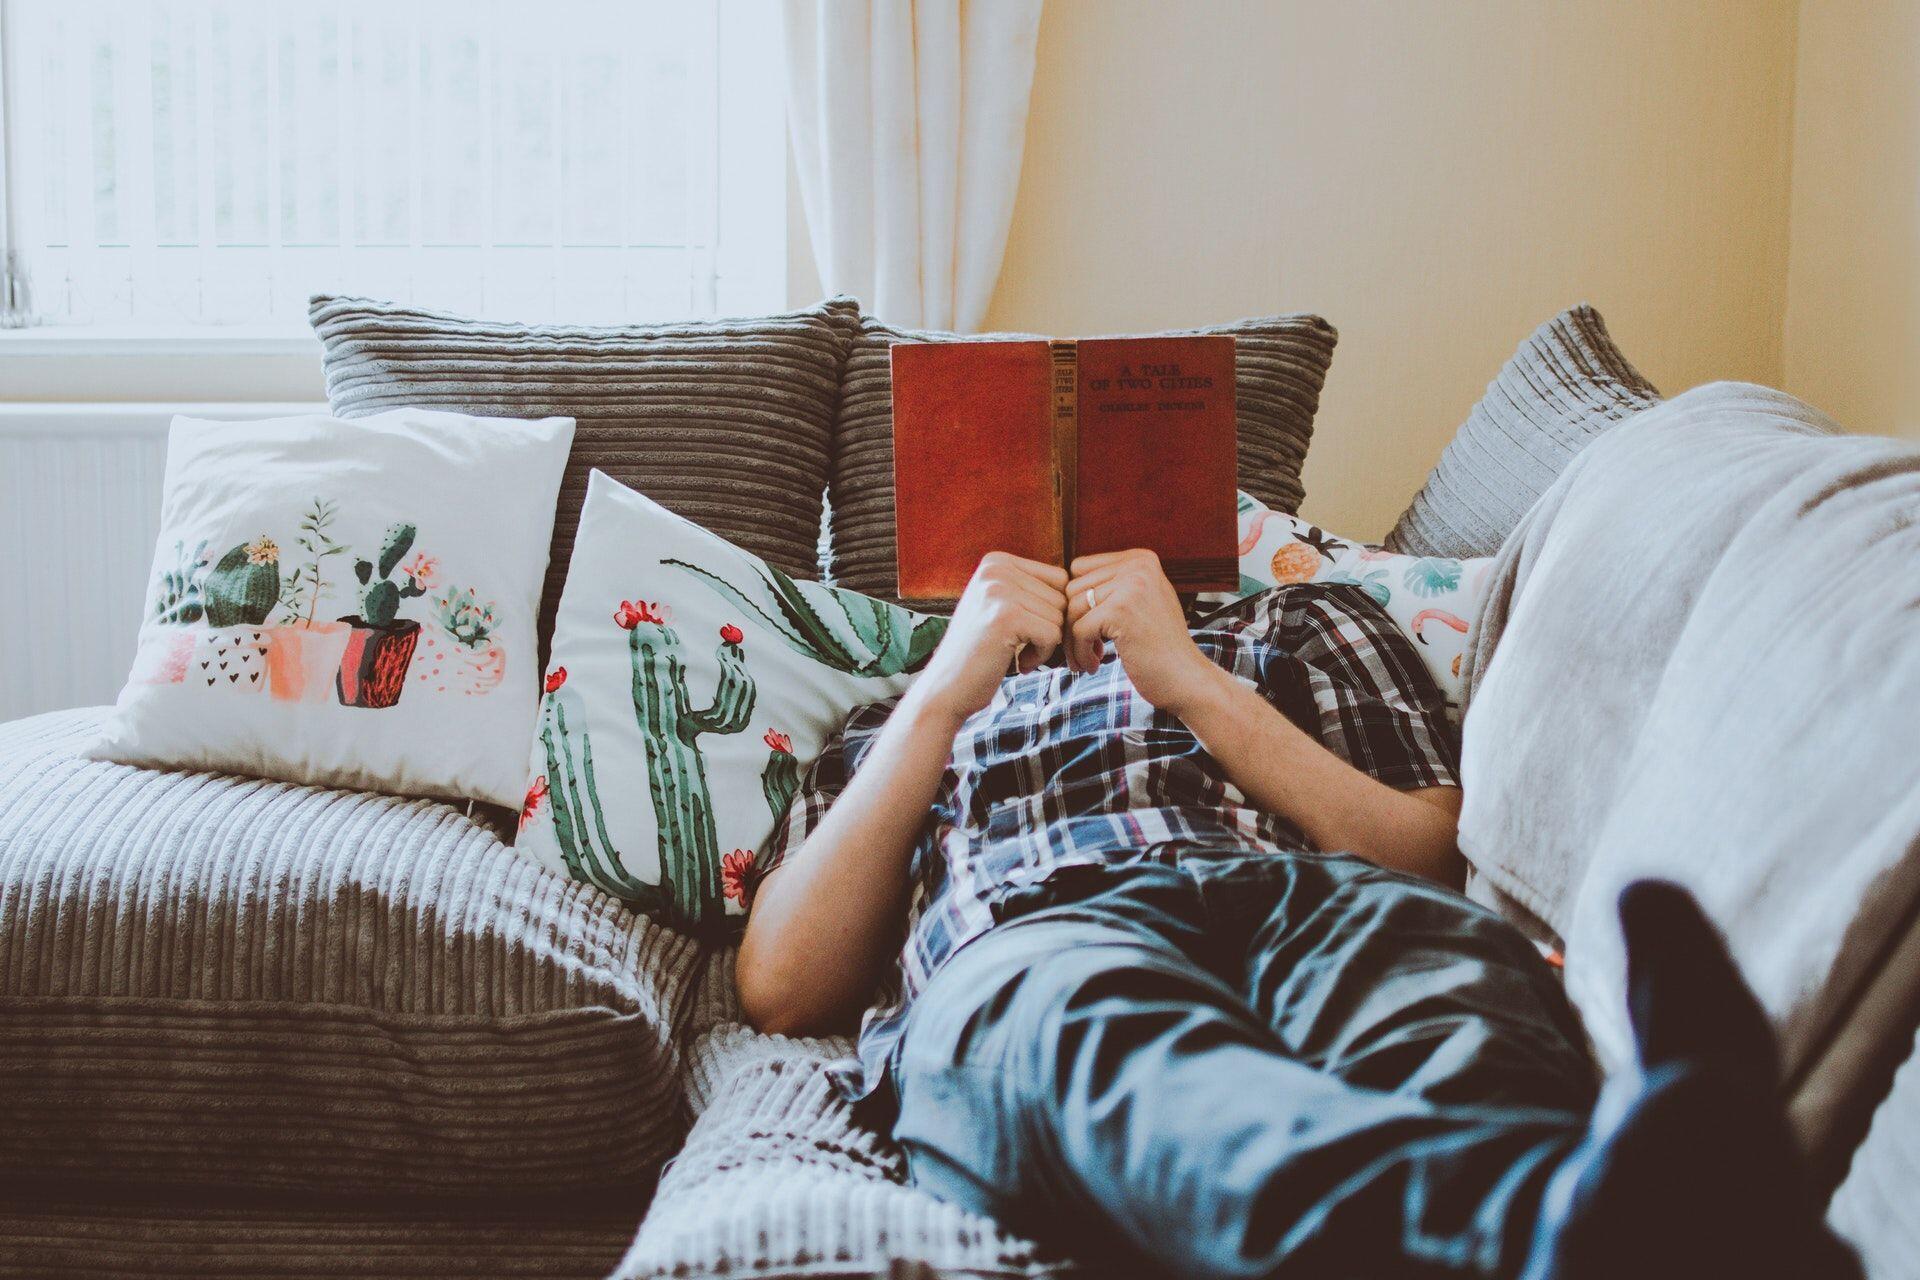 Sederhana, Lakukan 6 Kebiasaan Orang Sukses Ini Sebelum Tidur